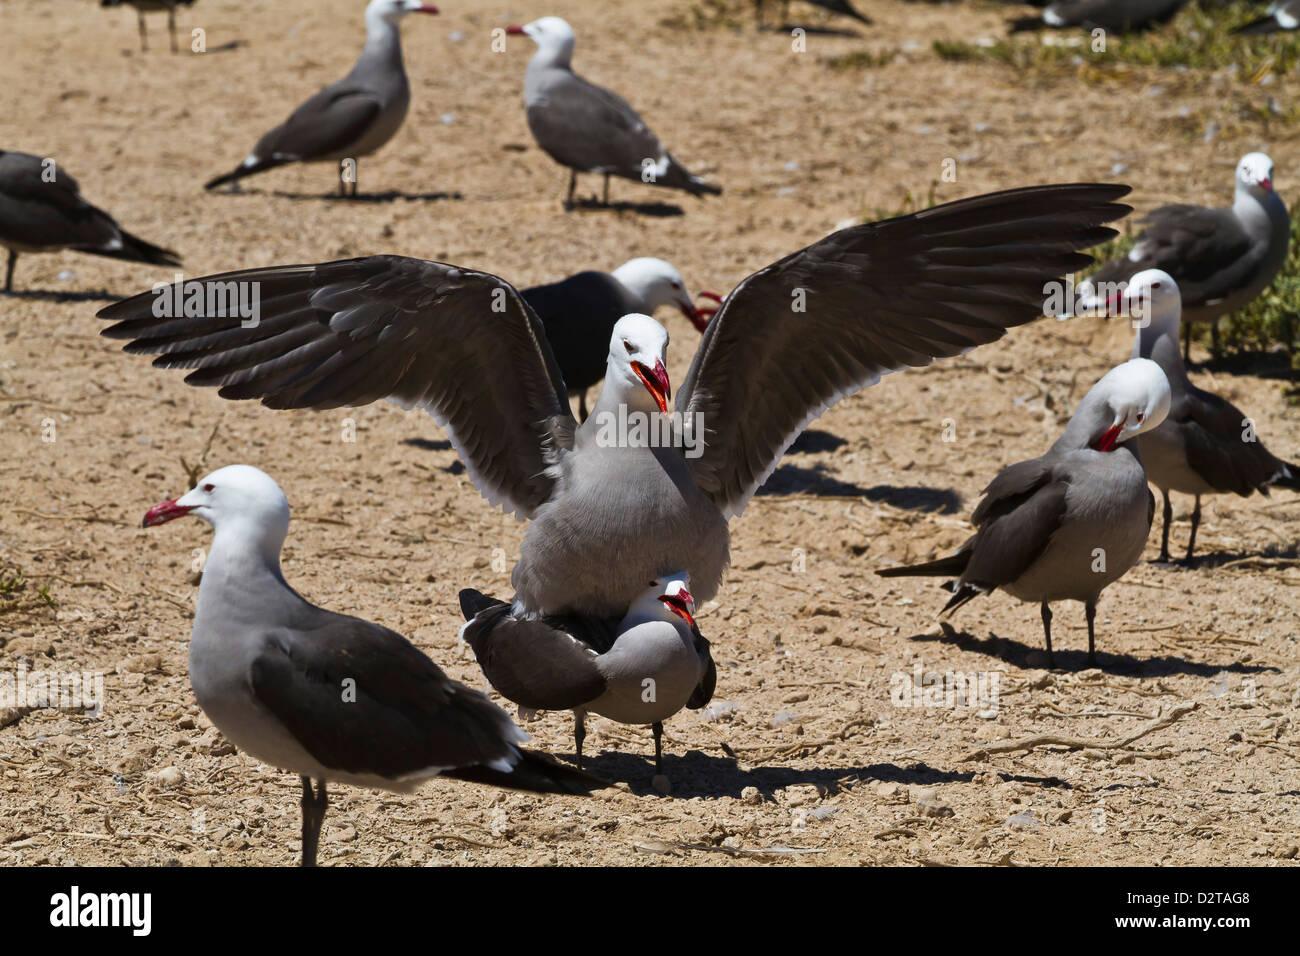 Heermann's gulls (Larus heermanni) mating, Isla Rasa, Gulf of California (Sea of Cortez), Mexico, North America - Stock Image